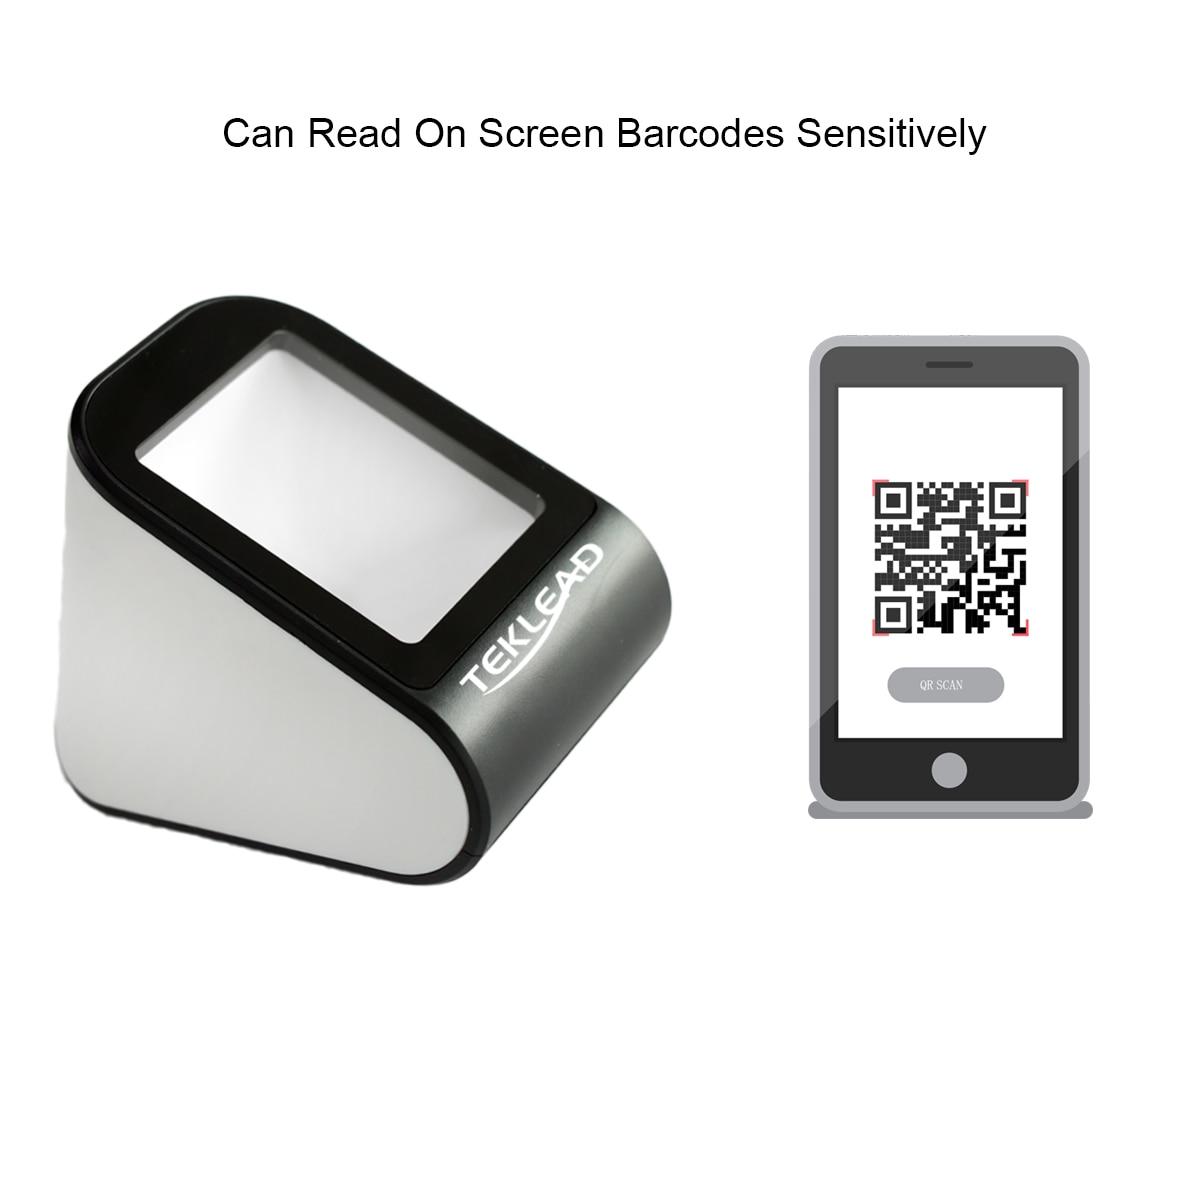 TEKLEAD Automatic 2D Barcode Scanner Hands-Free USB QR Barcode Reader For Mobile Payment For Store, Supermarket,Restaurant